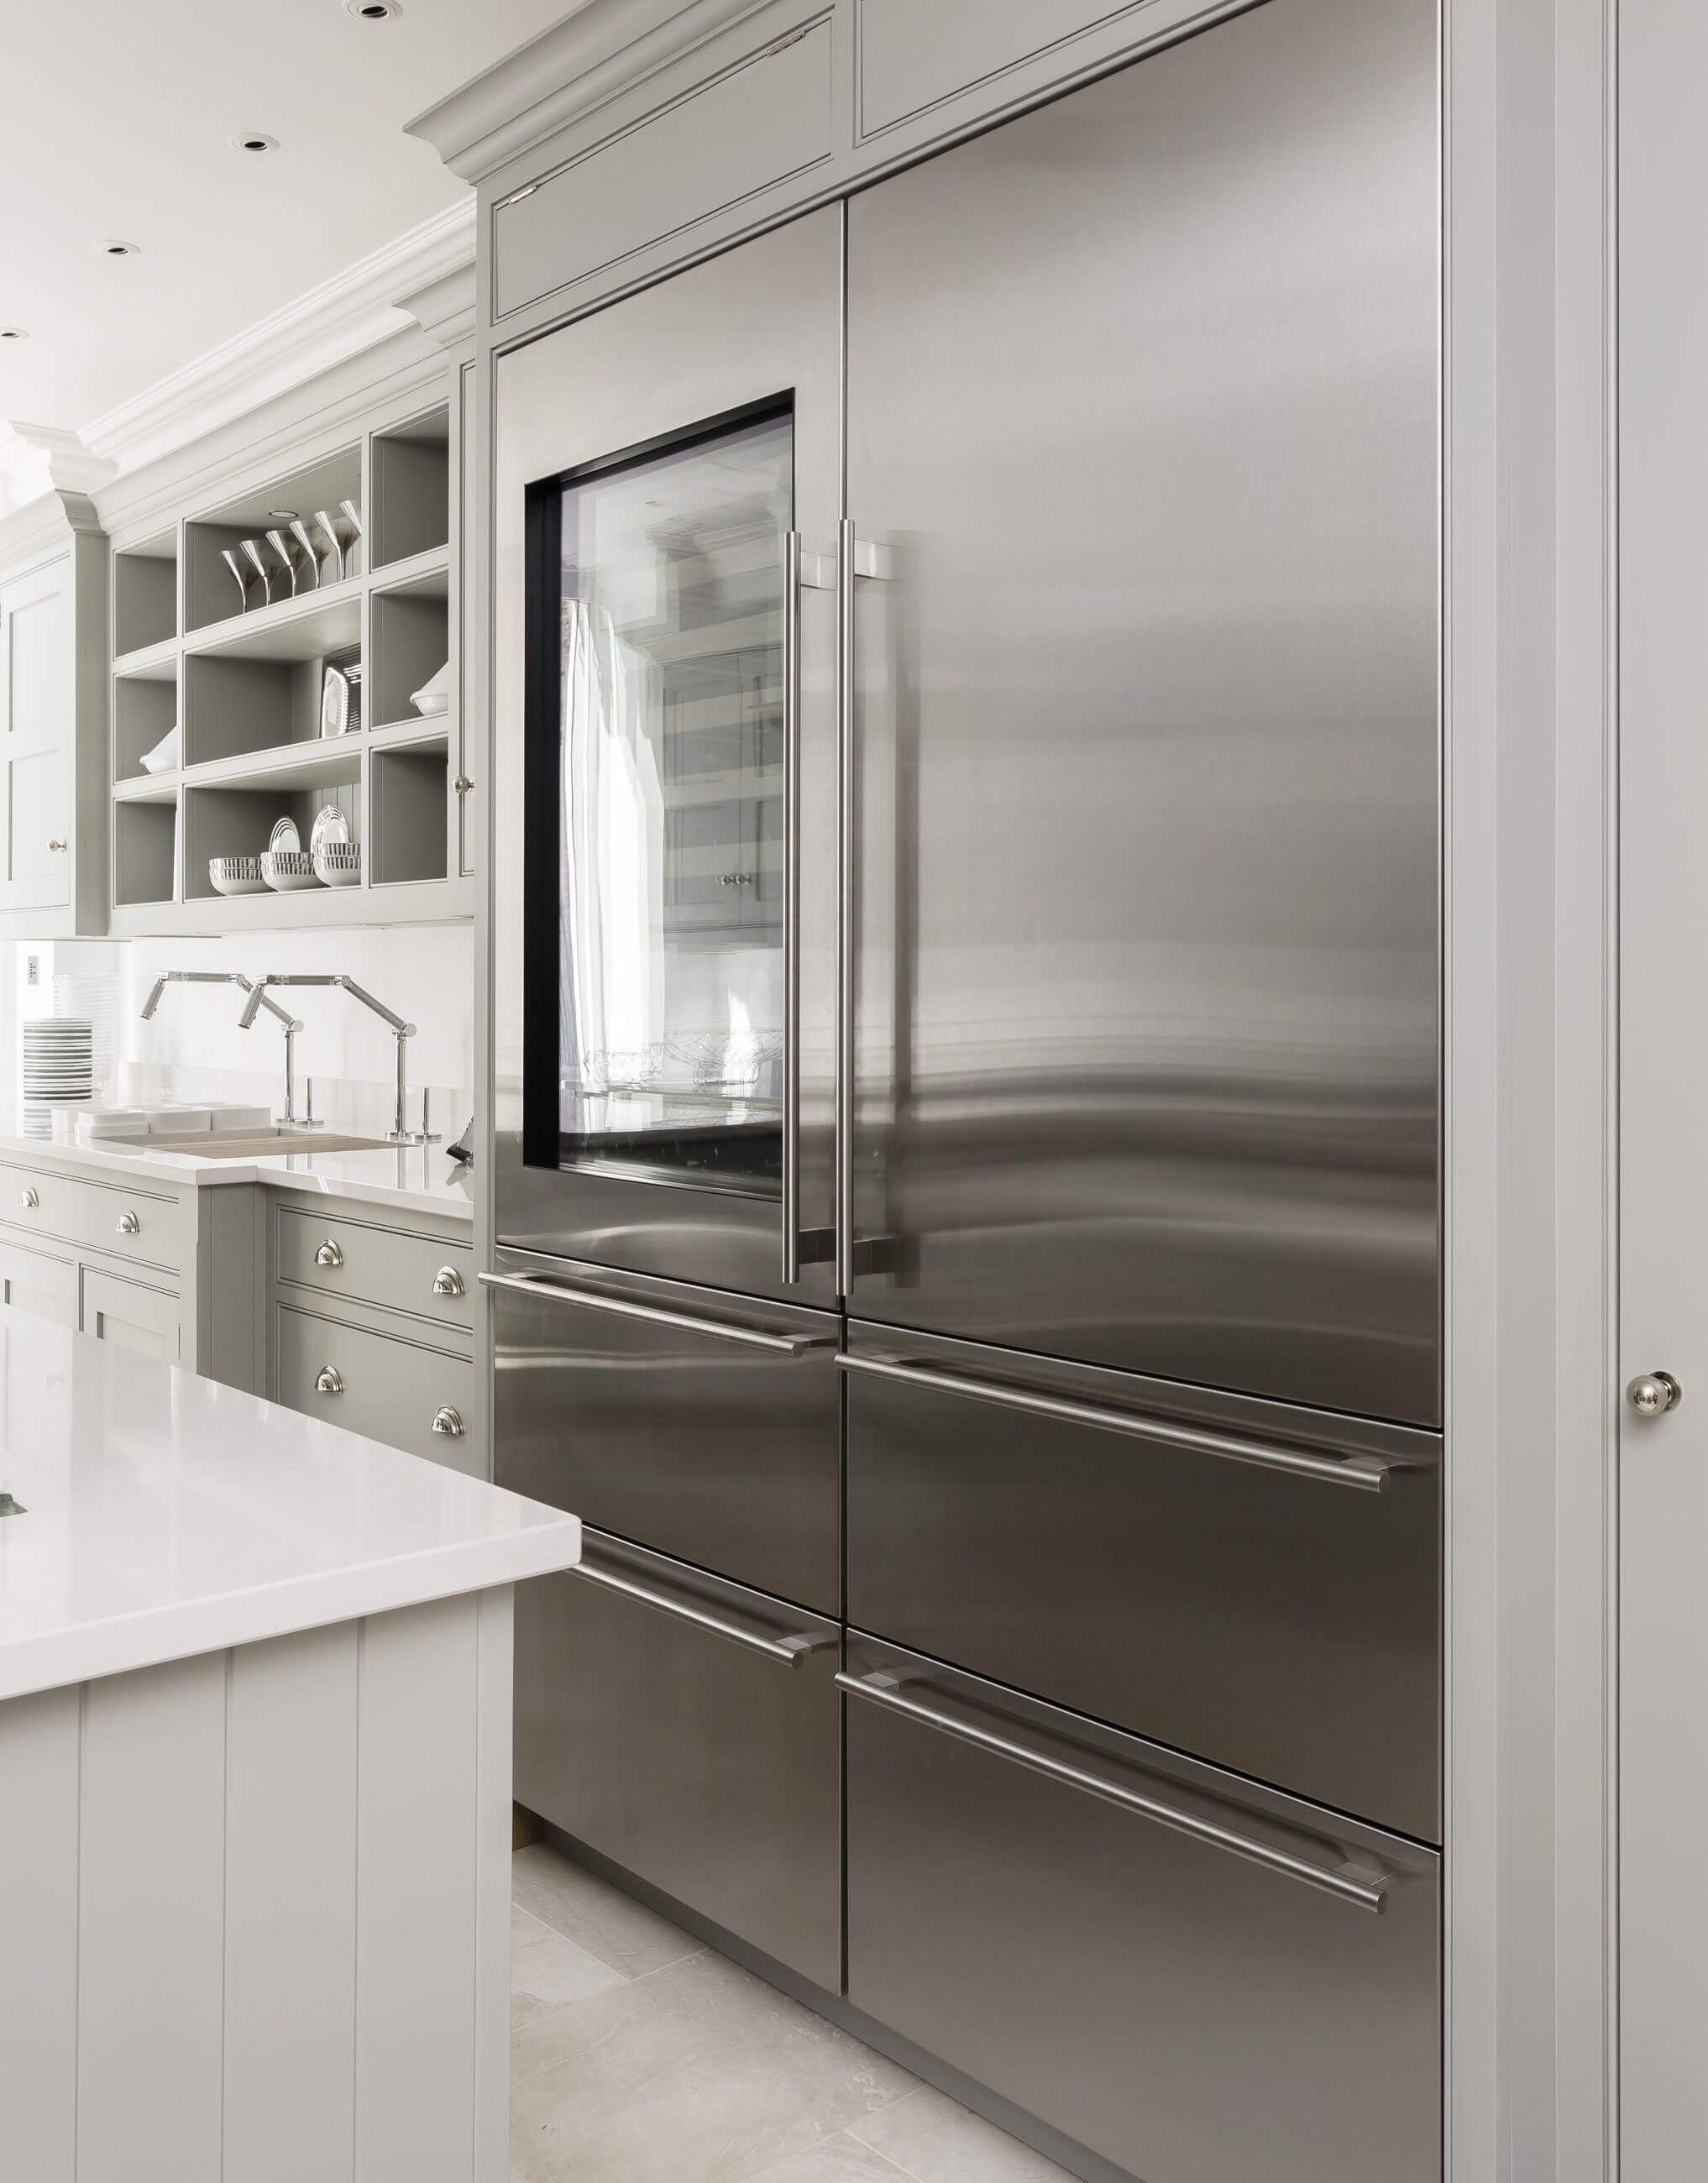 Luxury Kitchen Appliances   Kitchen appliances luxury ...